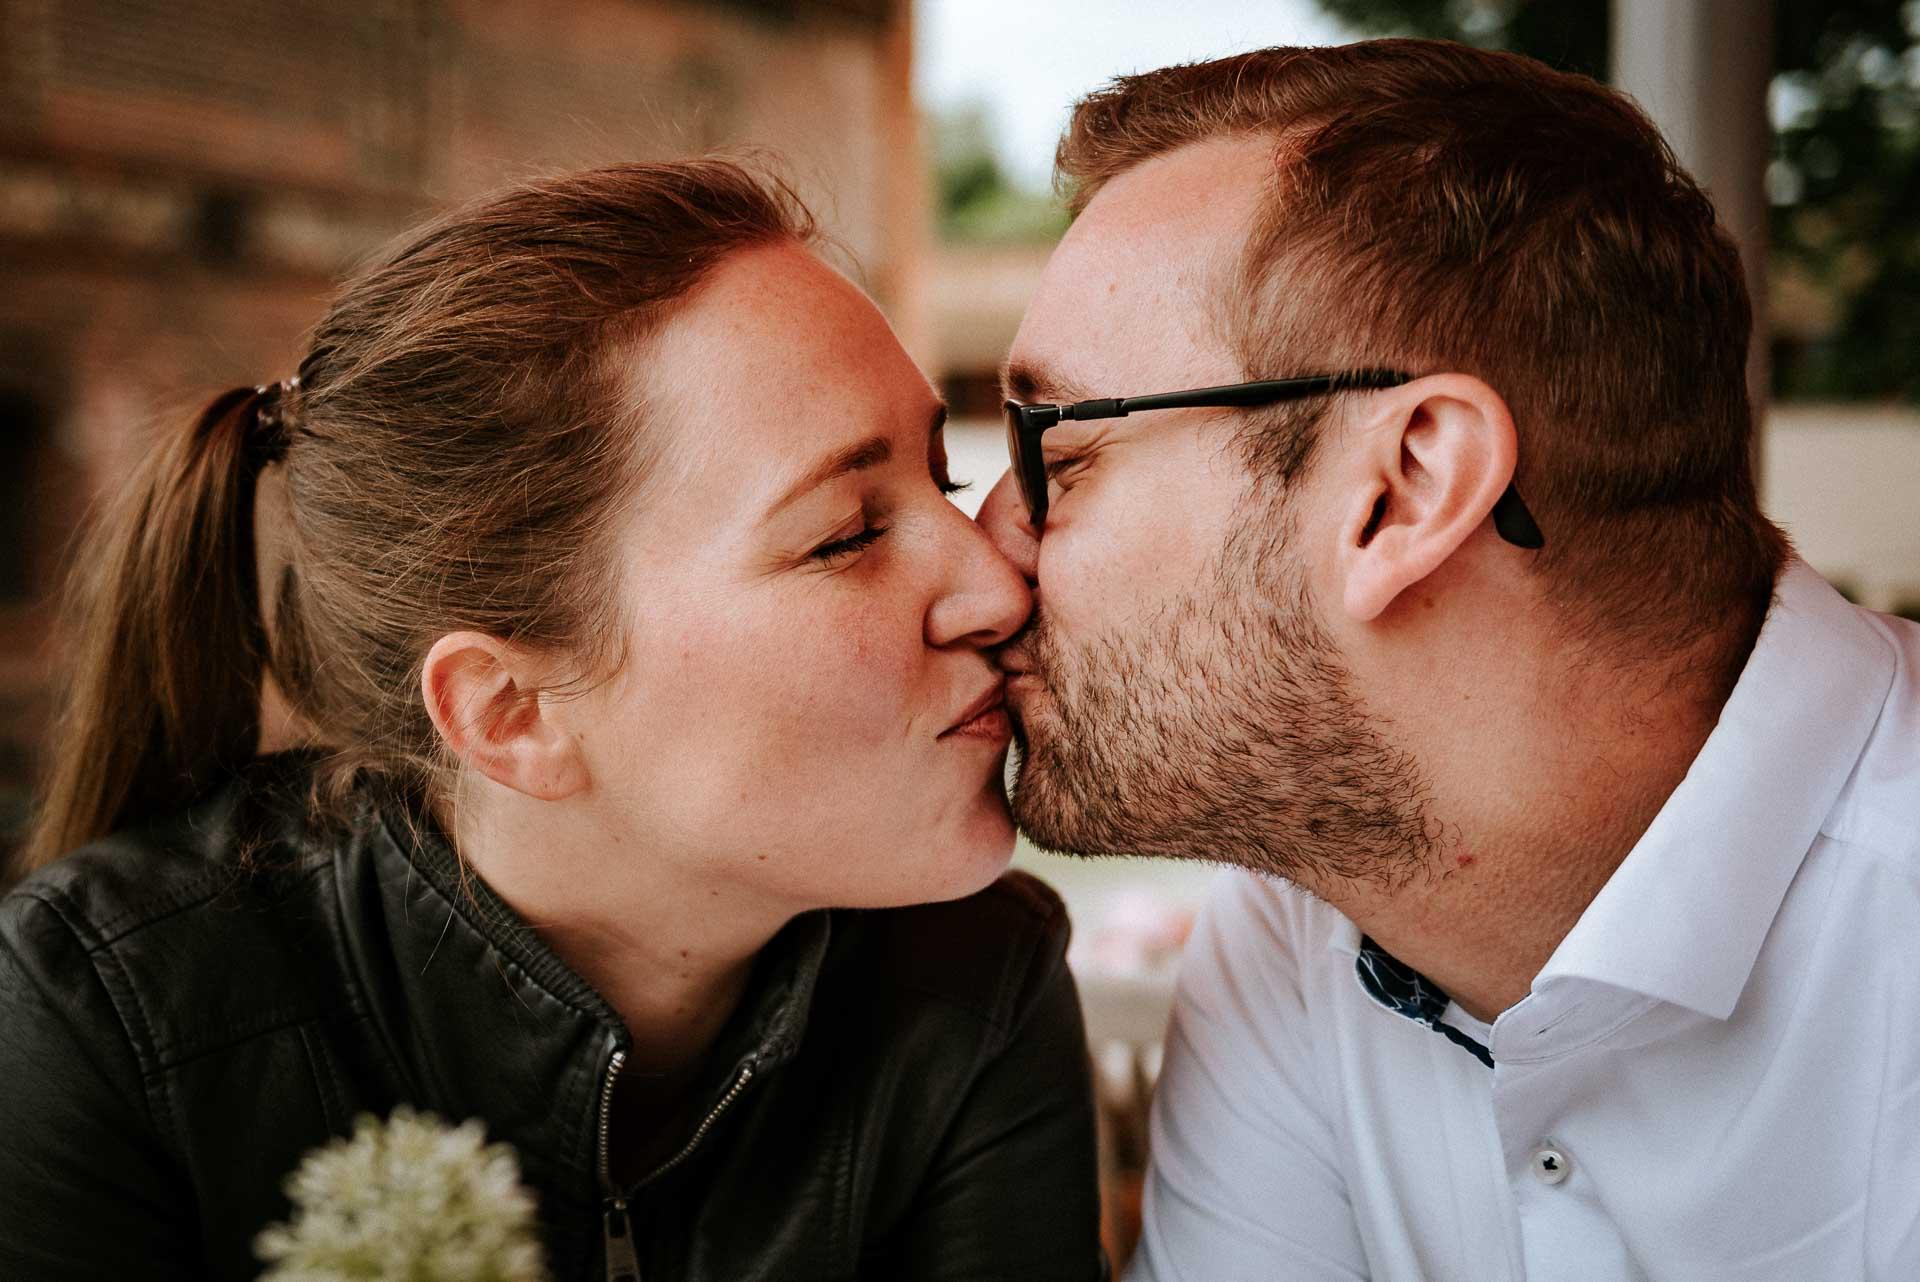 Küssendes Paar im Café